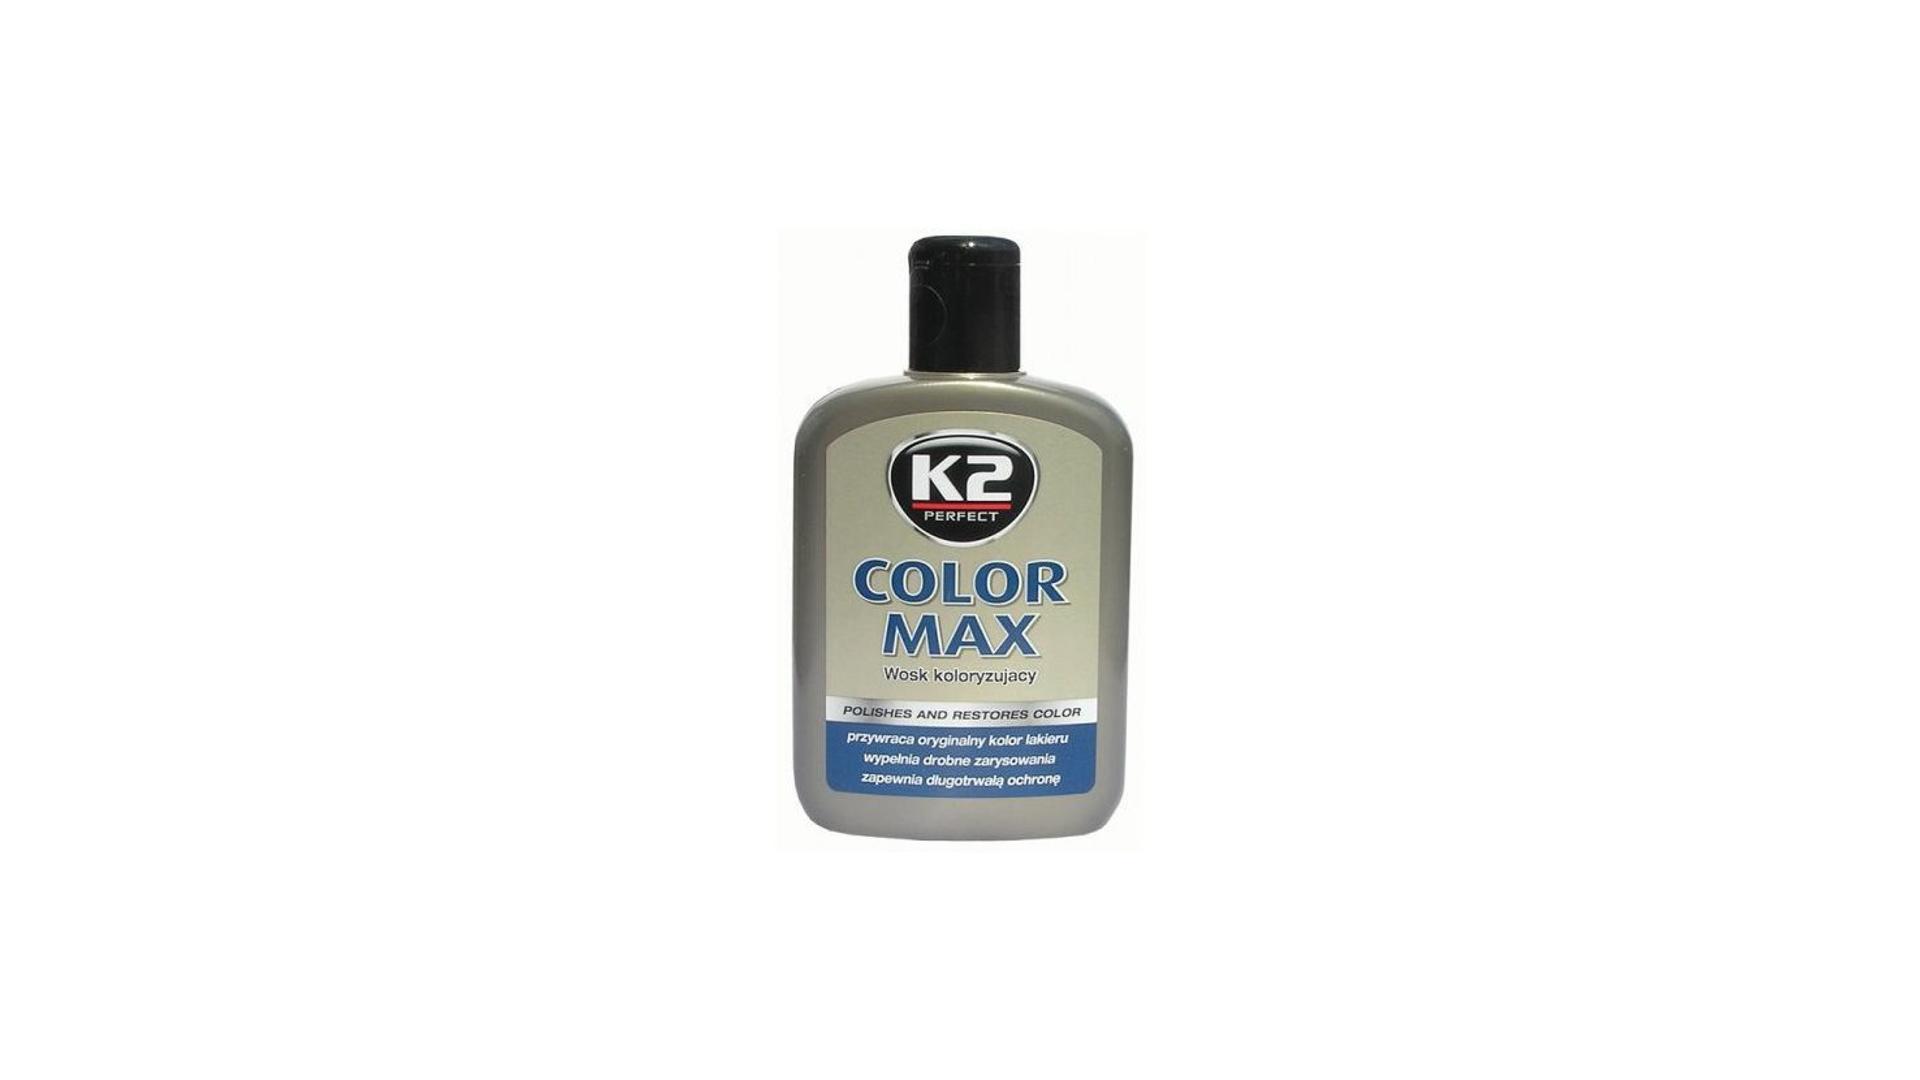 K2 COLOR MAX 200ml MODRÁ - aktivní vosk